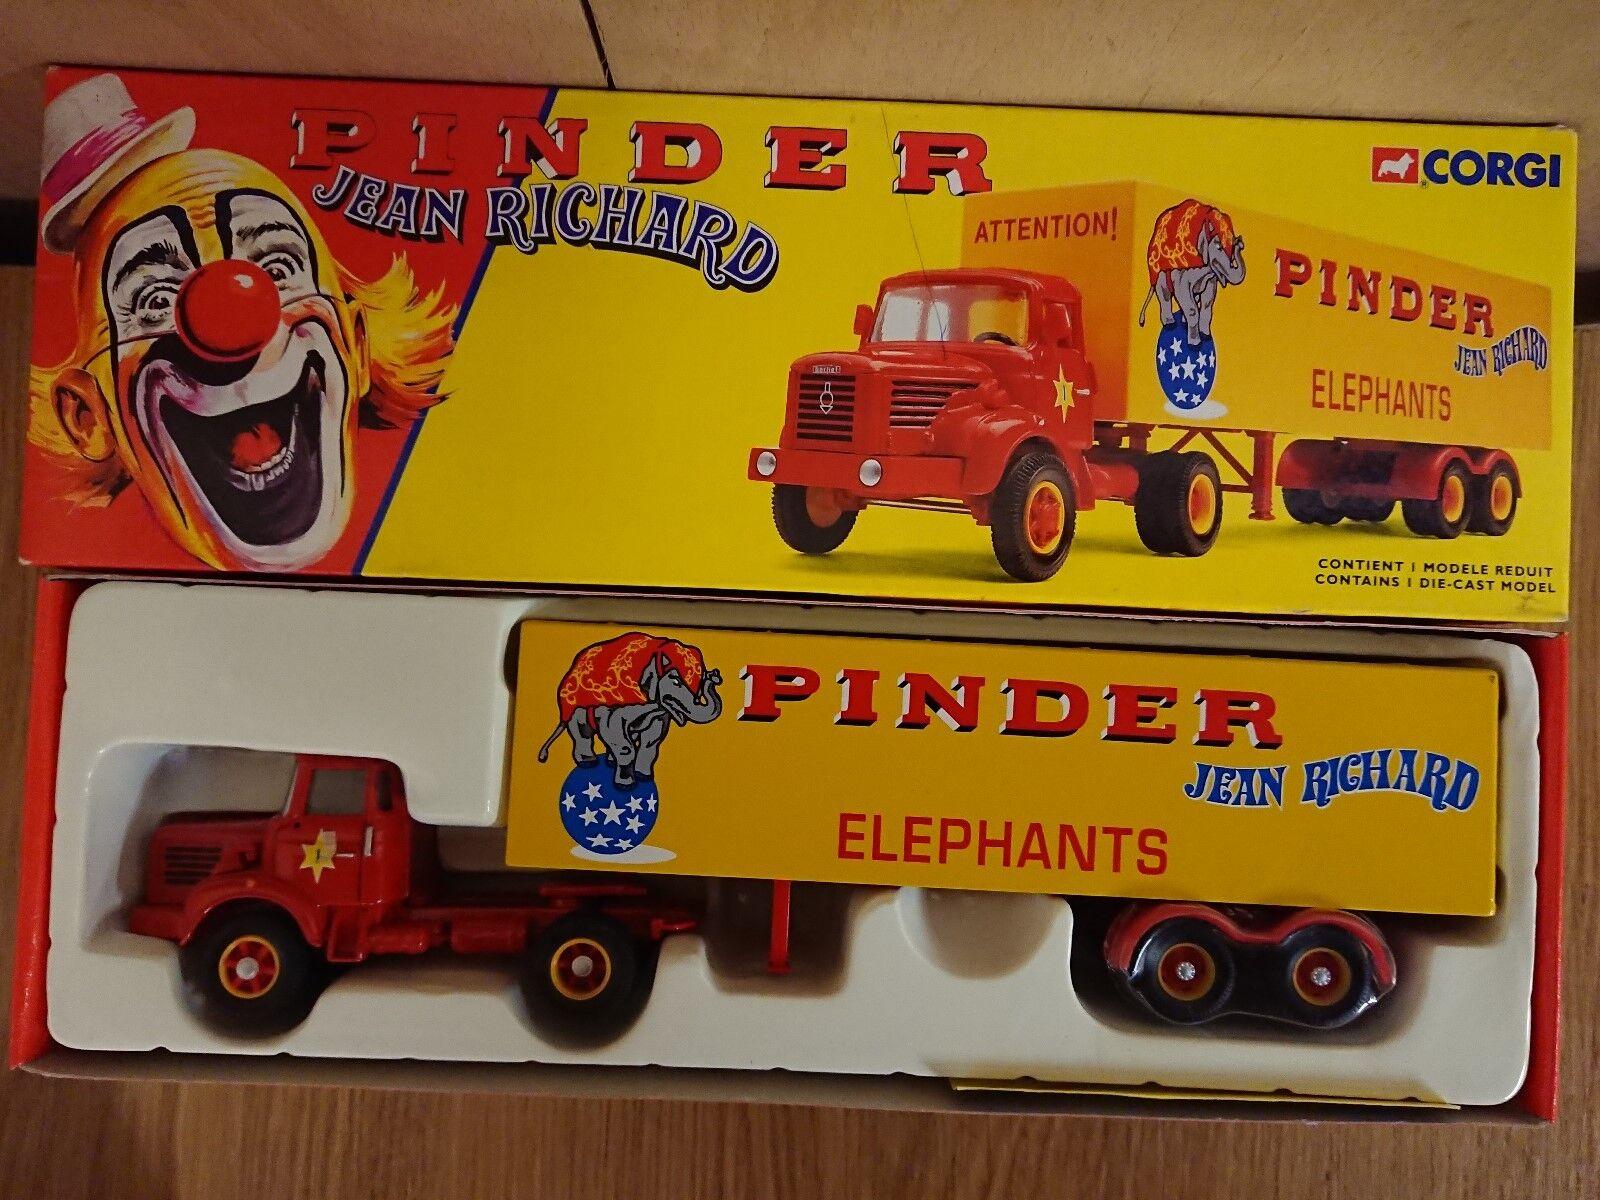 grandi prezzi scontati Corgi 70101 Pinder J. J. J. Riautod Circus Berliet TLR Semi Fourgon Ltd Ed 0005 of 4400  all'ingrosso a buon mercato